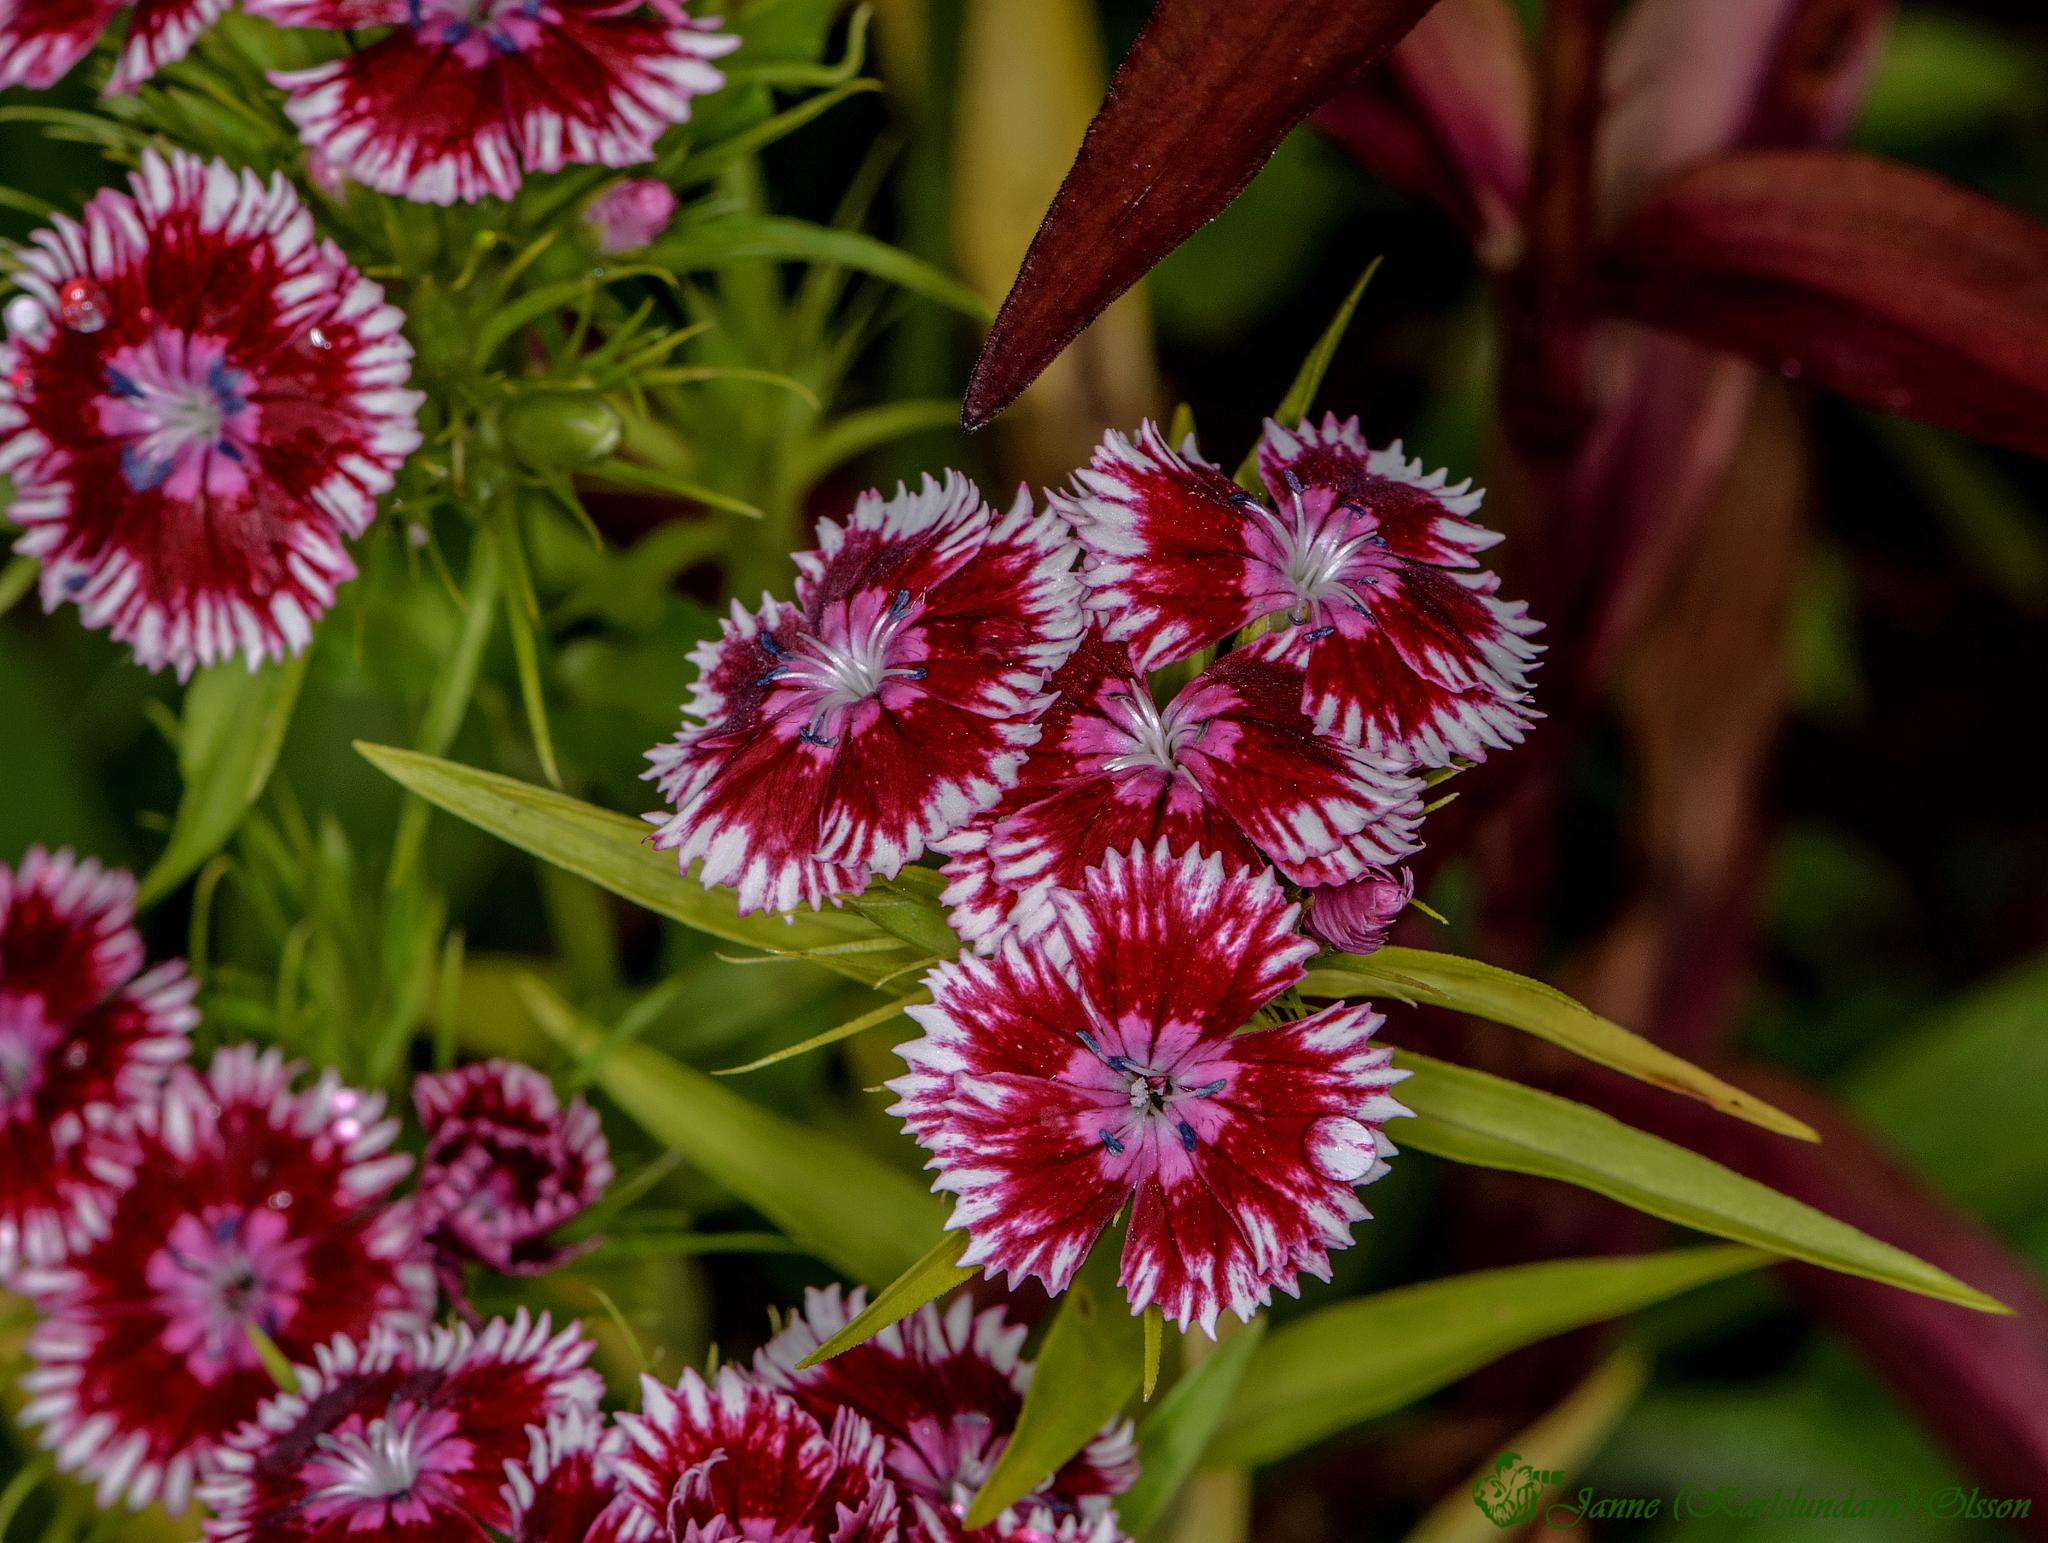 Borstnejlika (Dianthus barbatus) by (Karlslundarn)